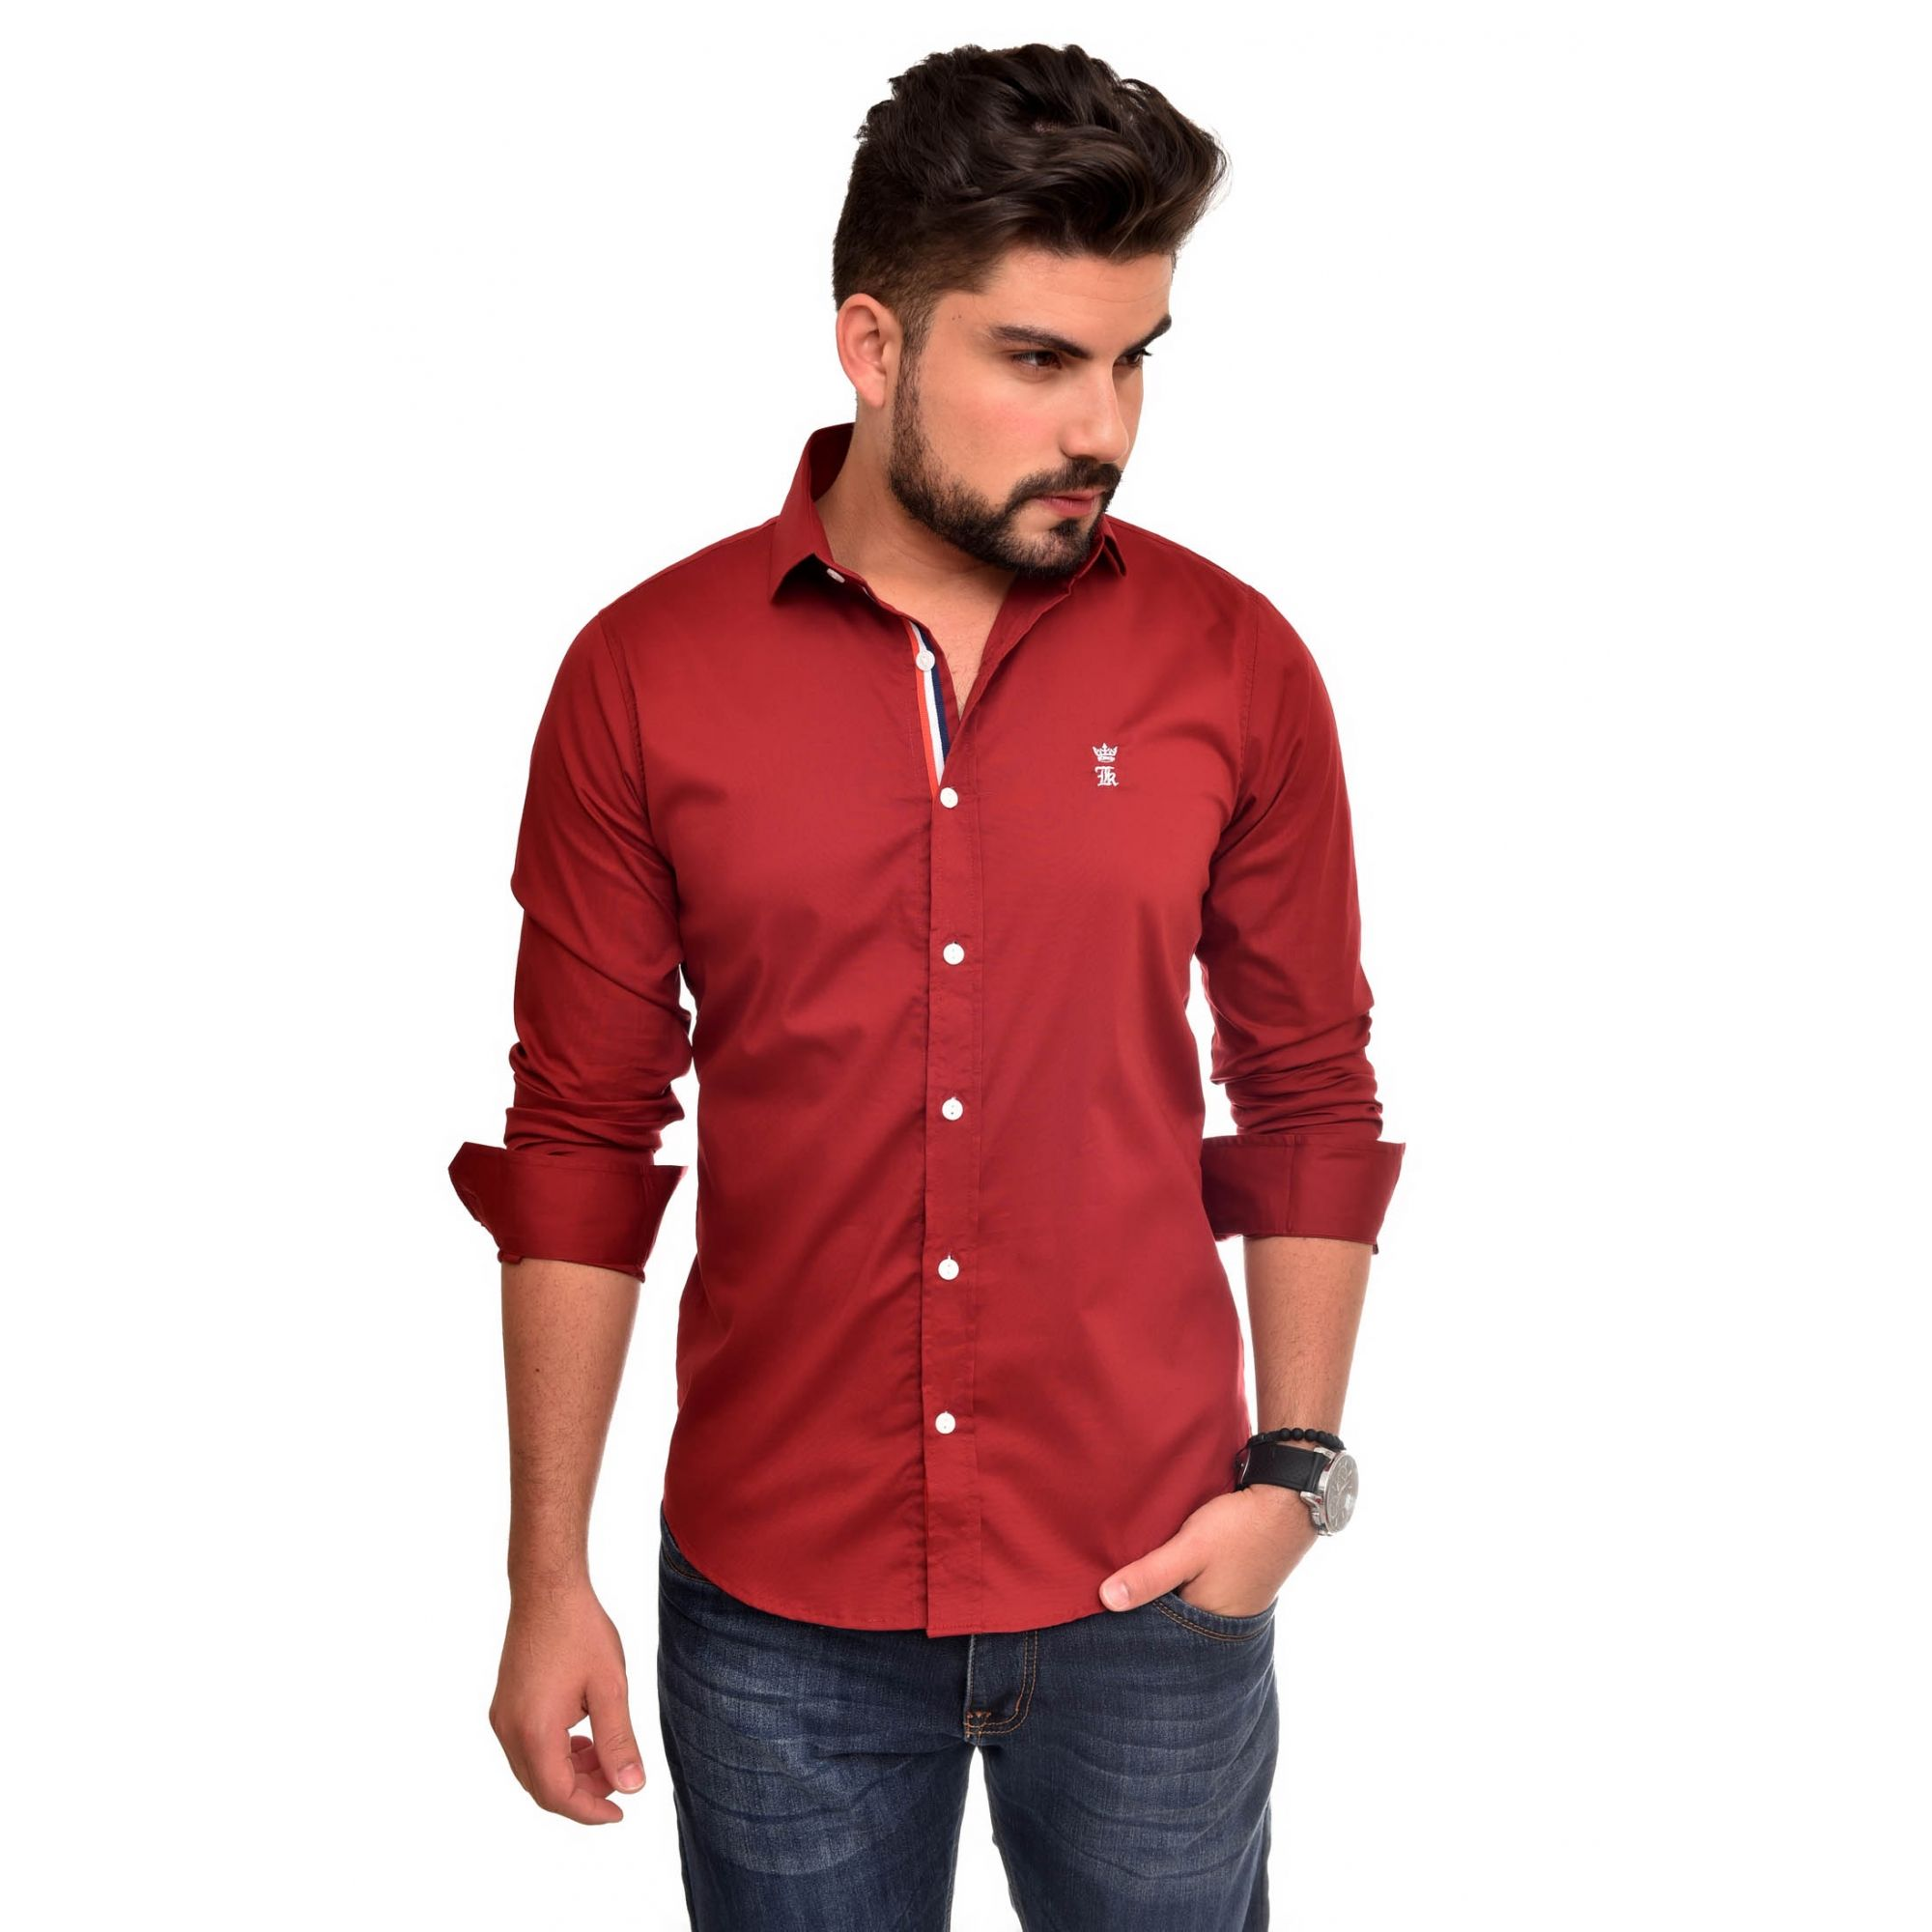 Camisa Social SK Style Bordo   - Ca Brasileira